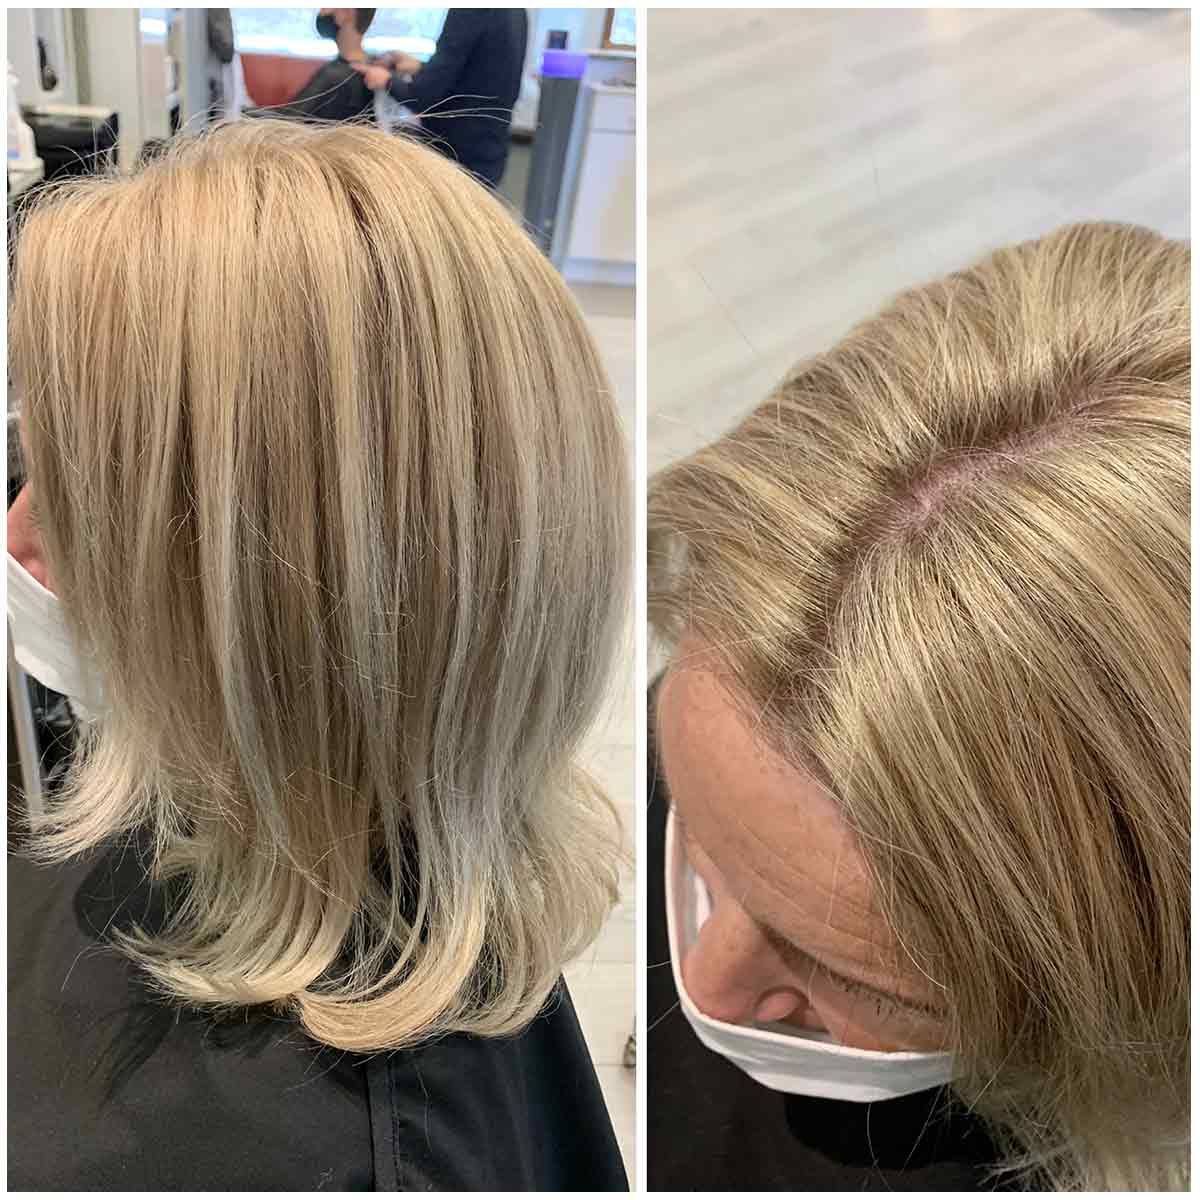 Larisa frisør blonde hår